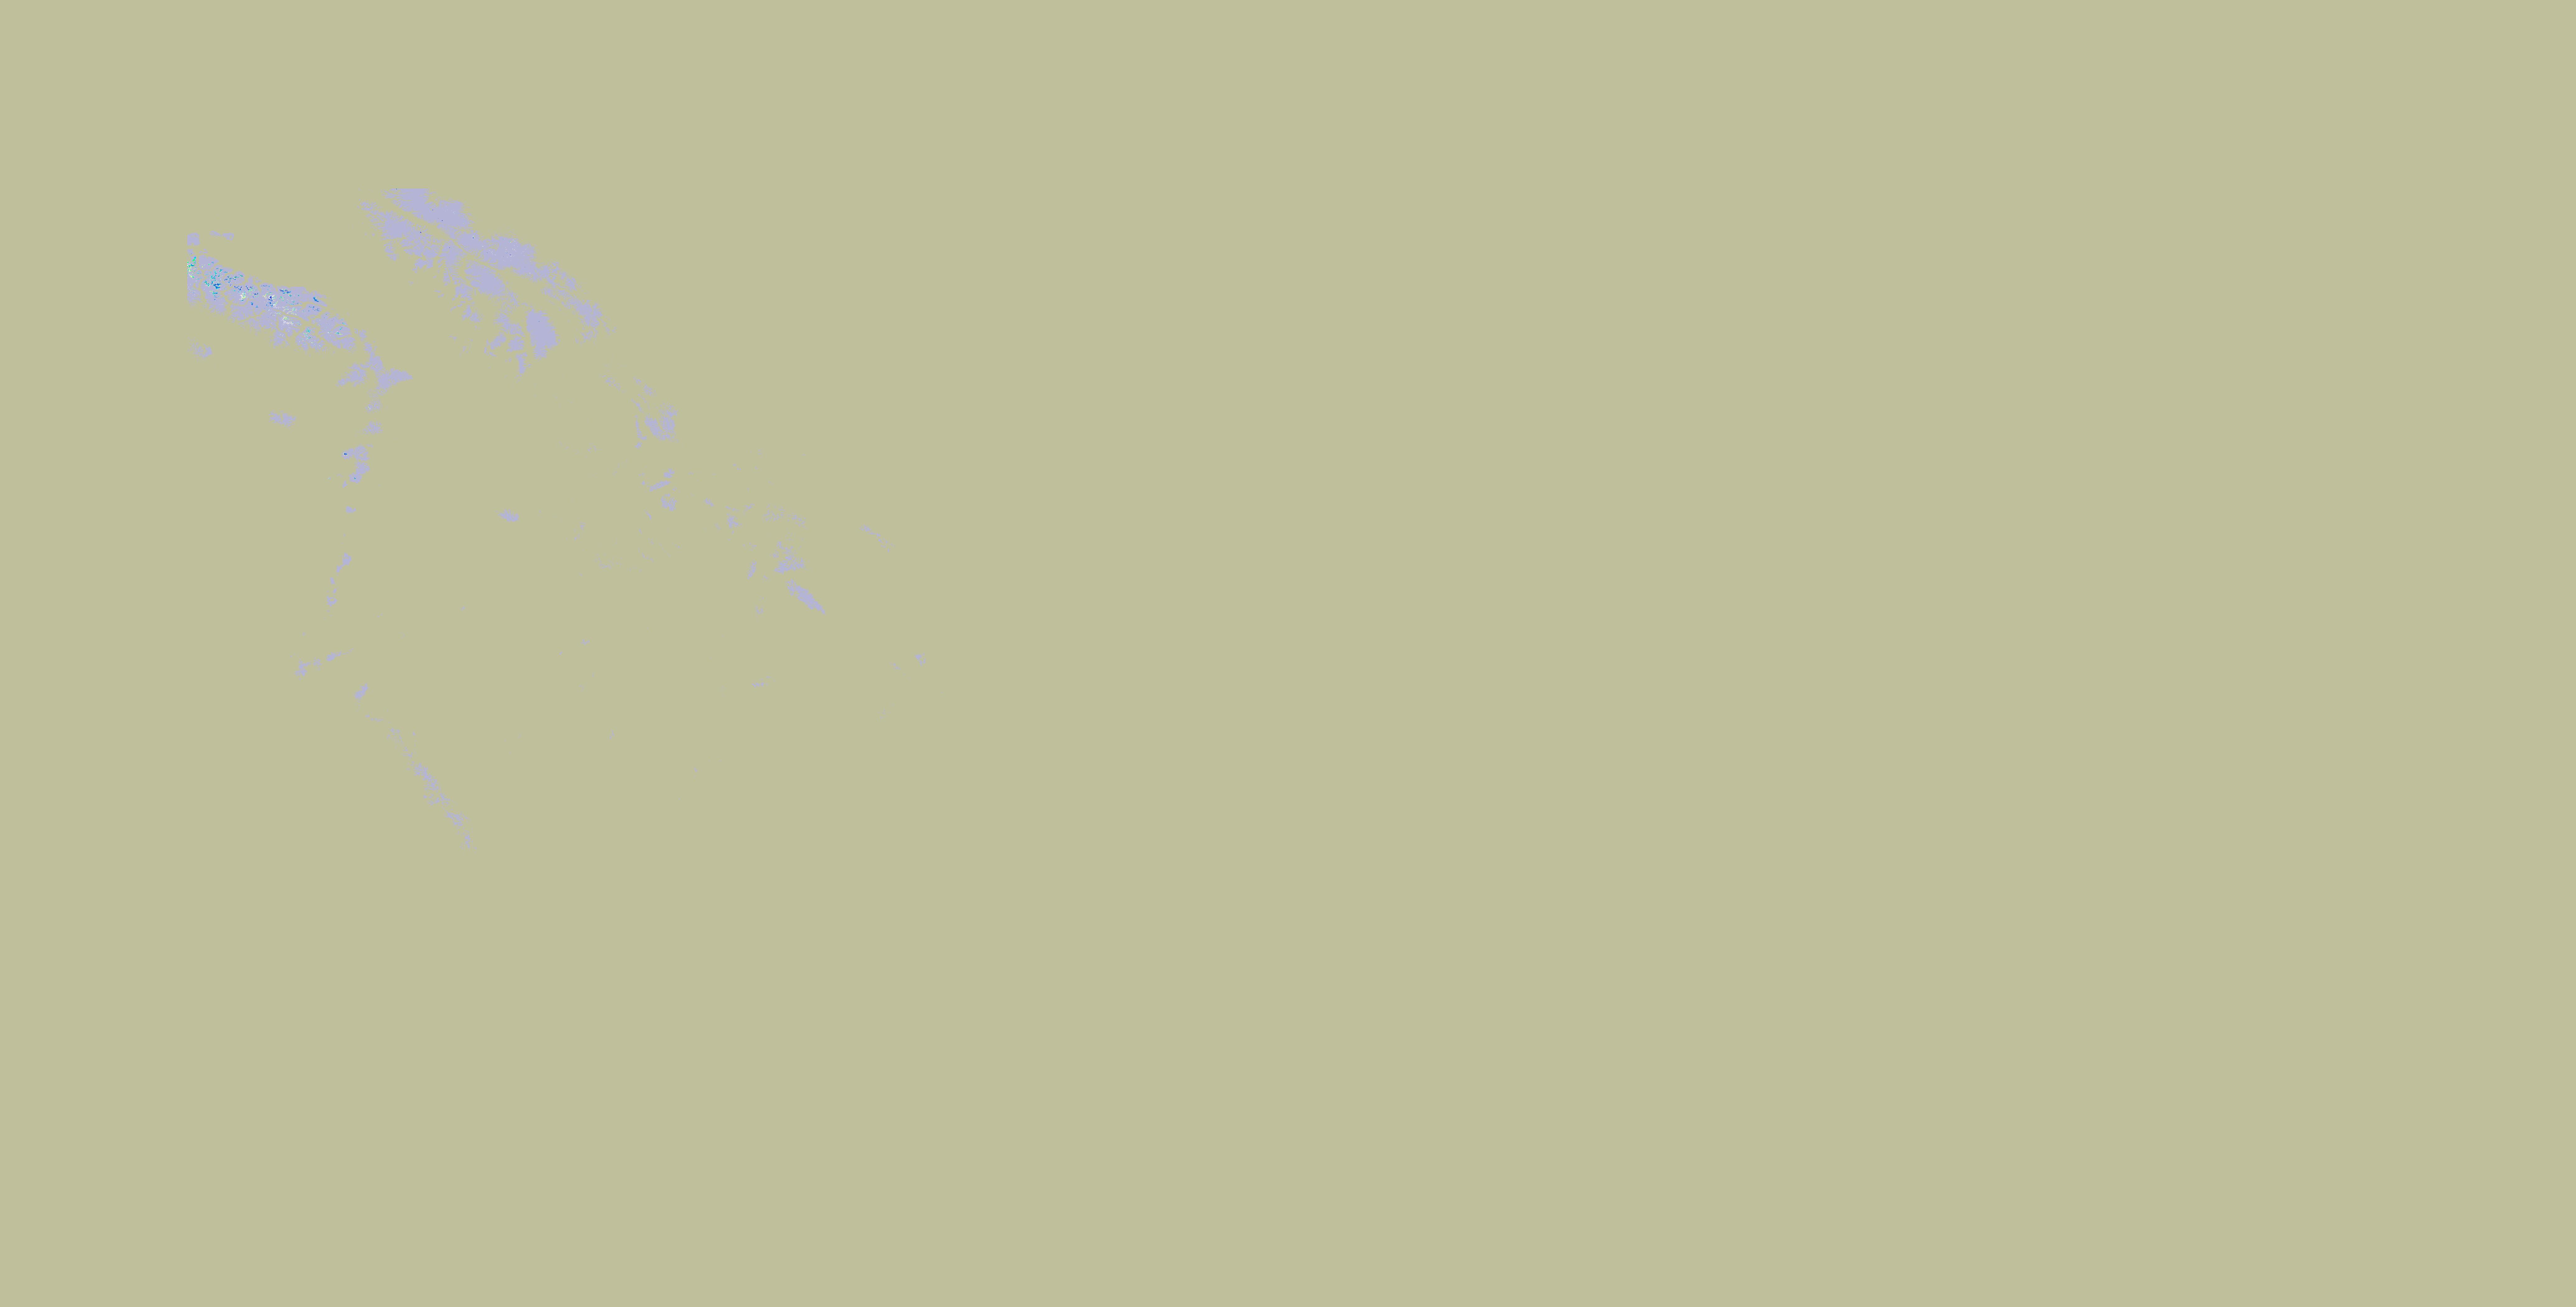 Falling snowflake clipart png clip art transparent Download Falling Snow Png HQ PNG Image | FreePNGImg clip art transparent